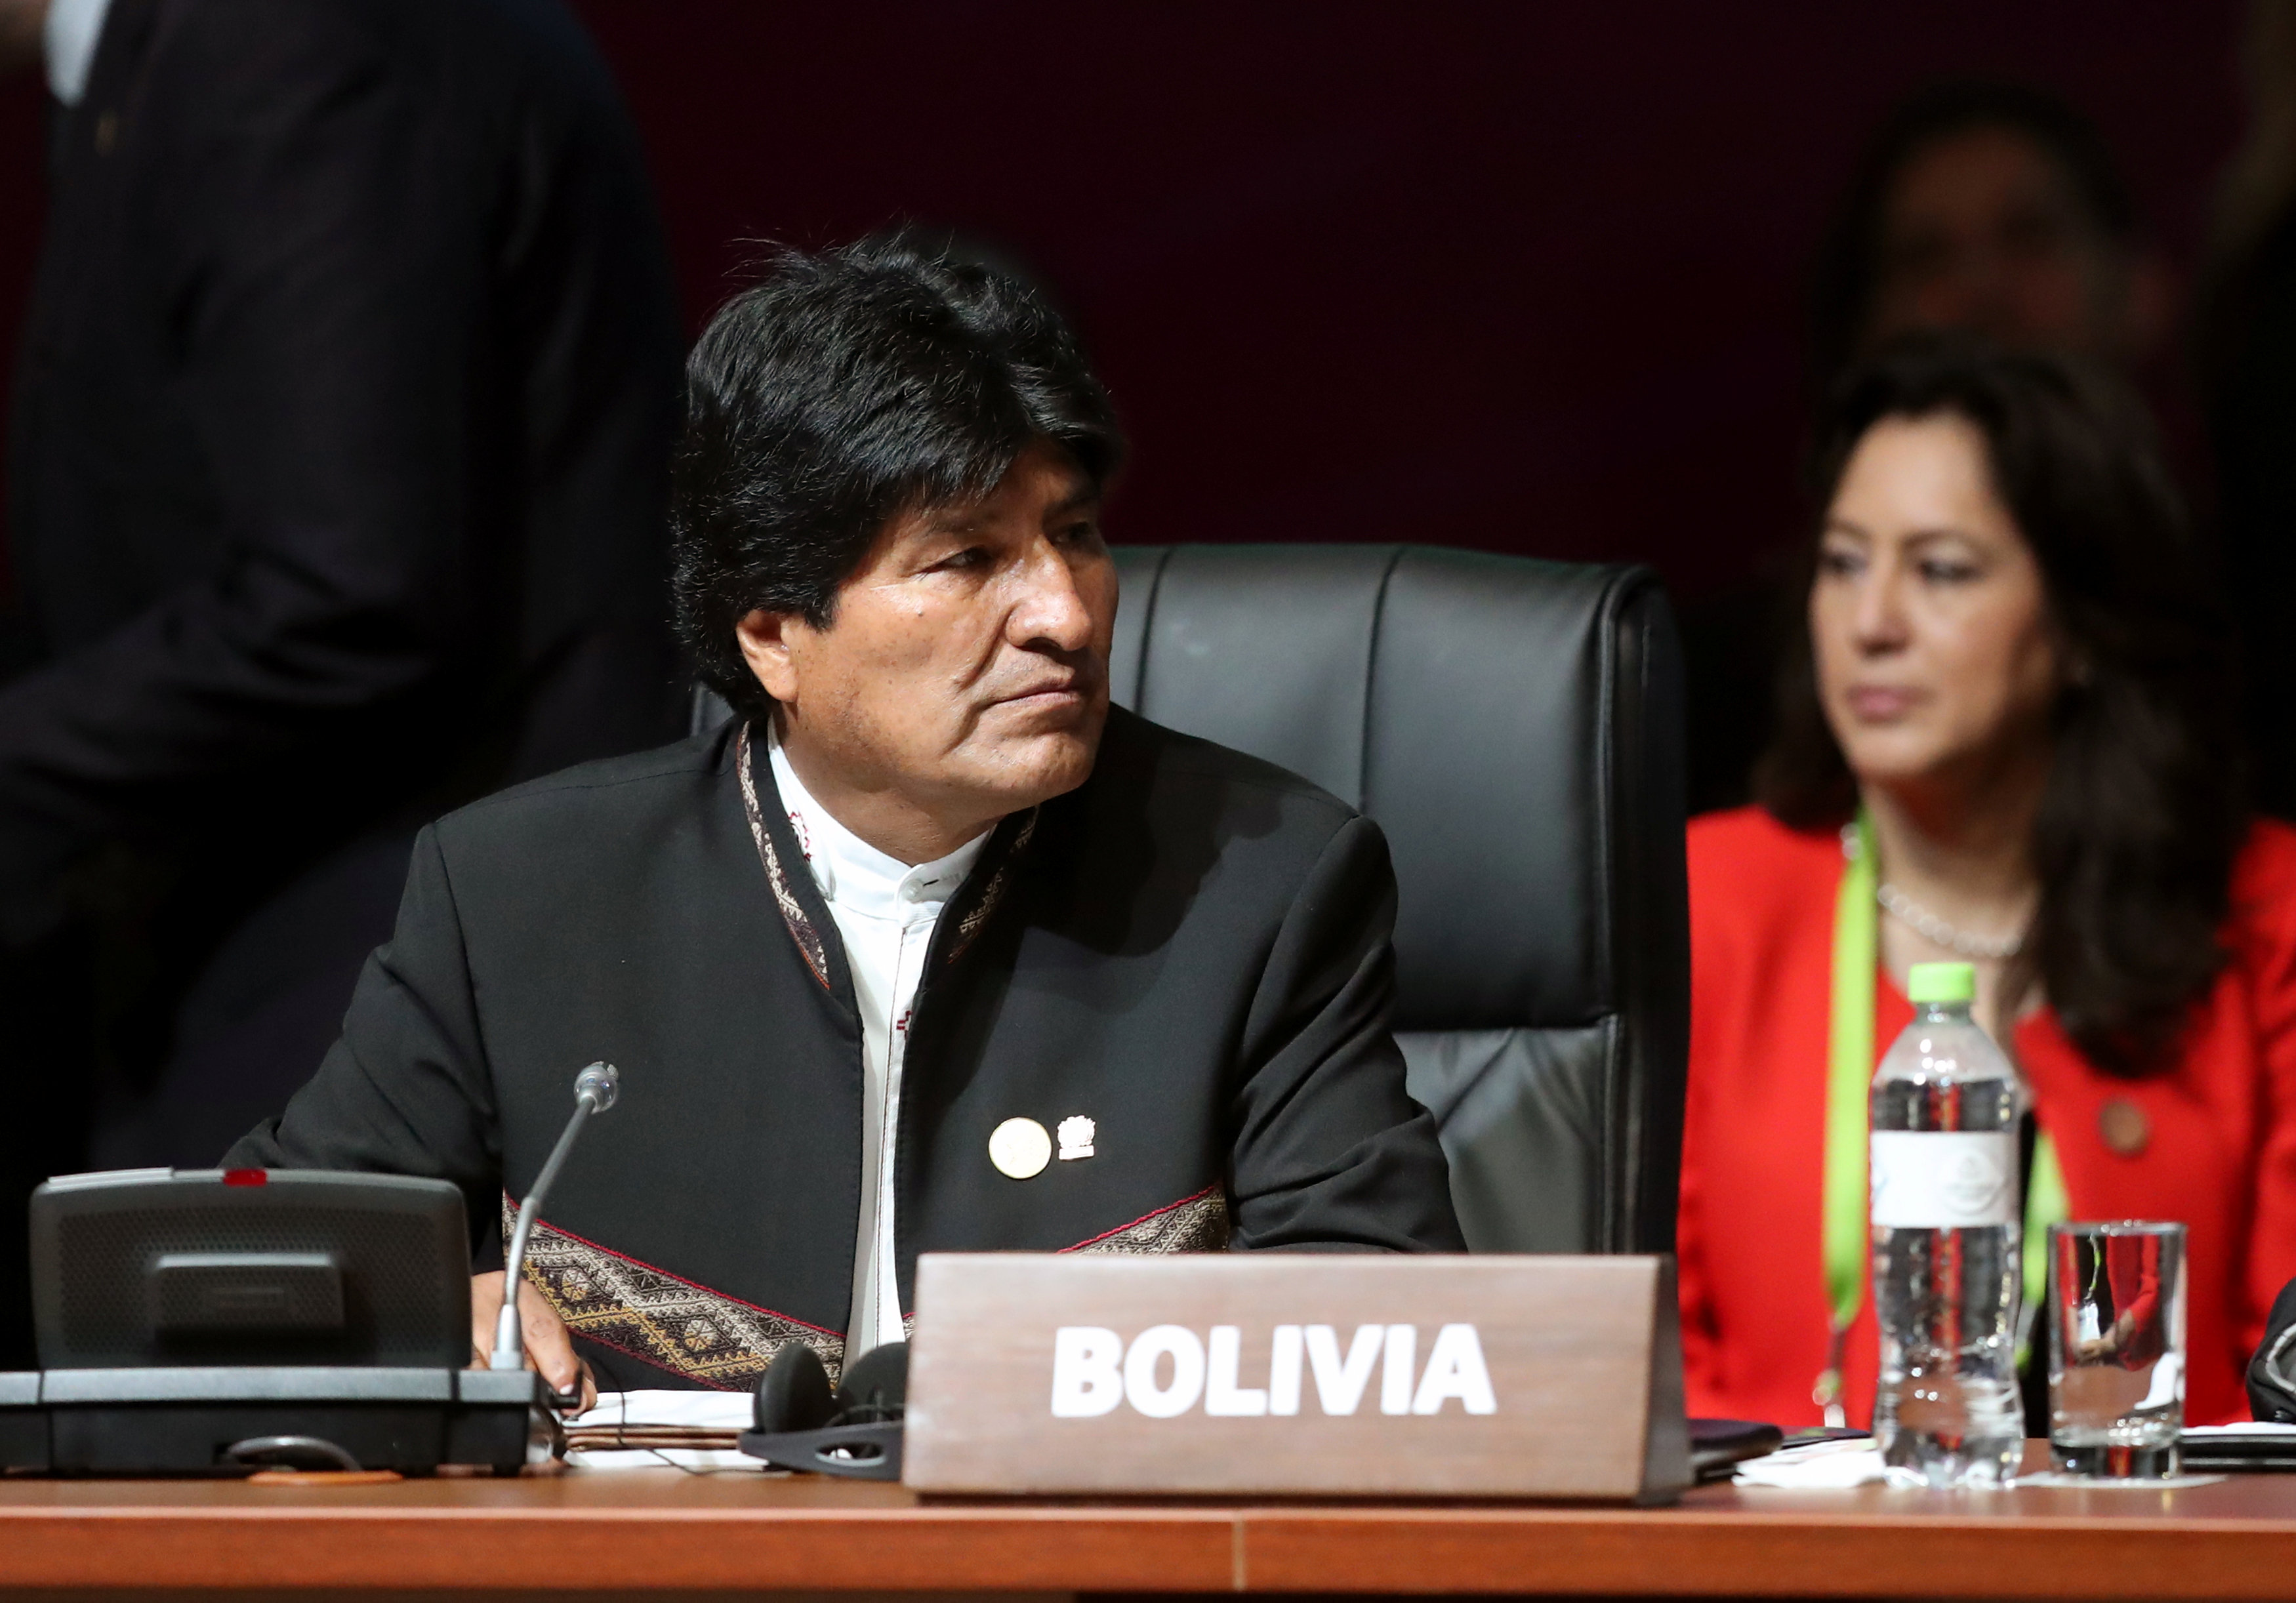 Falso tuit del Senado boliviano anunció la muerte de Evo Morales